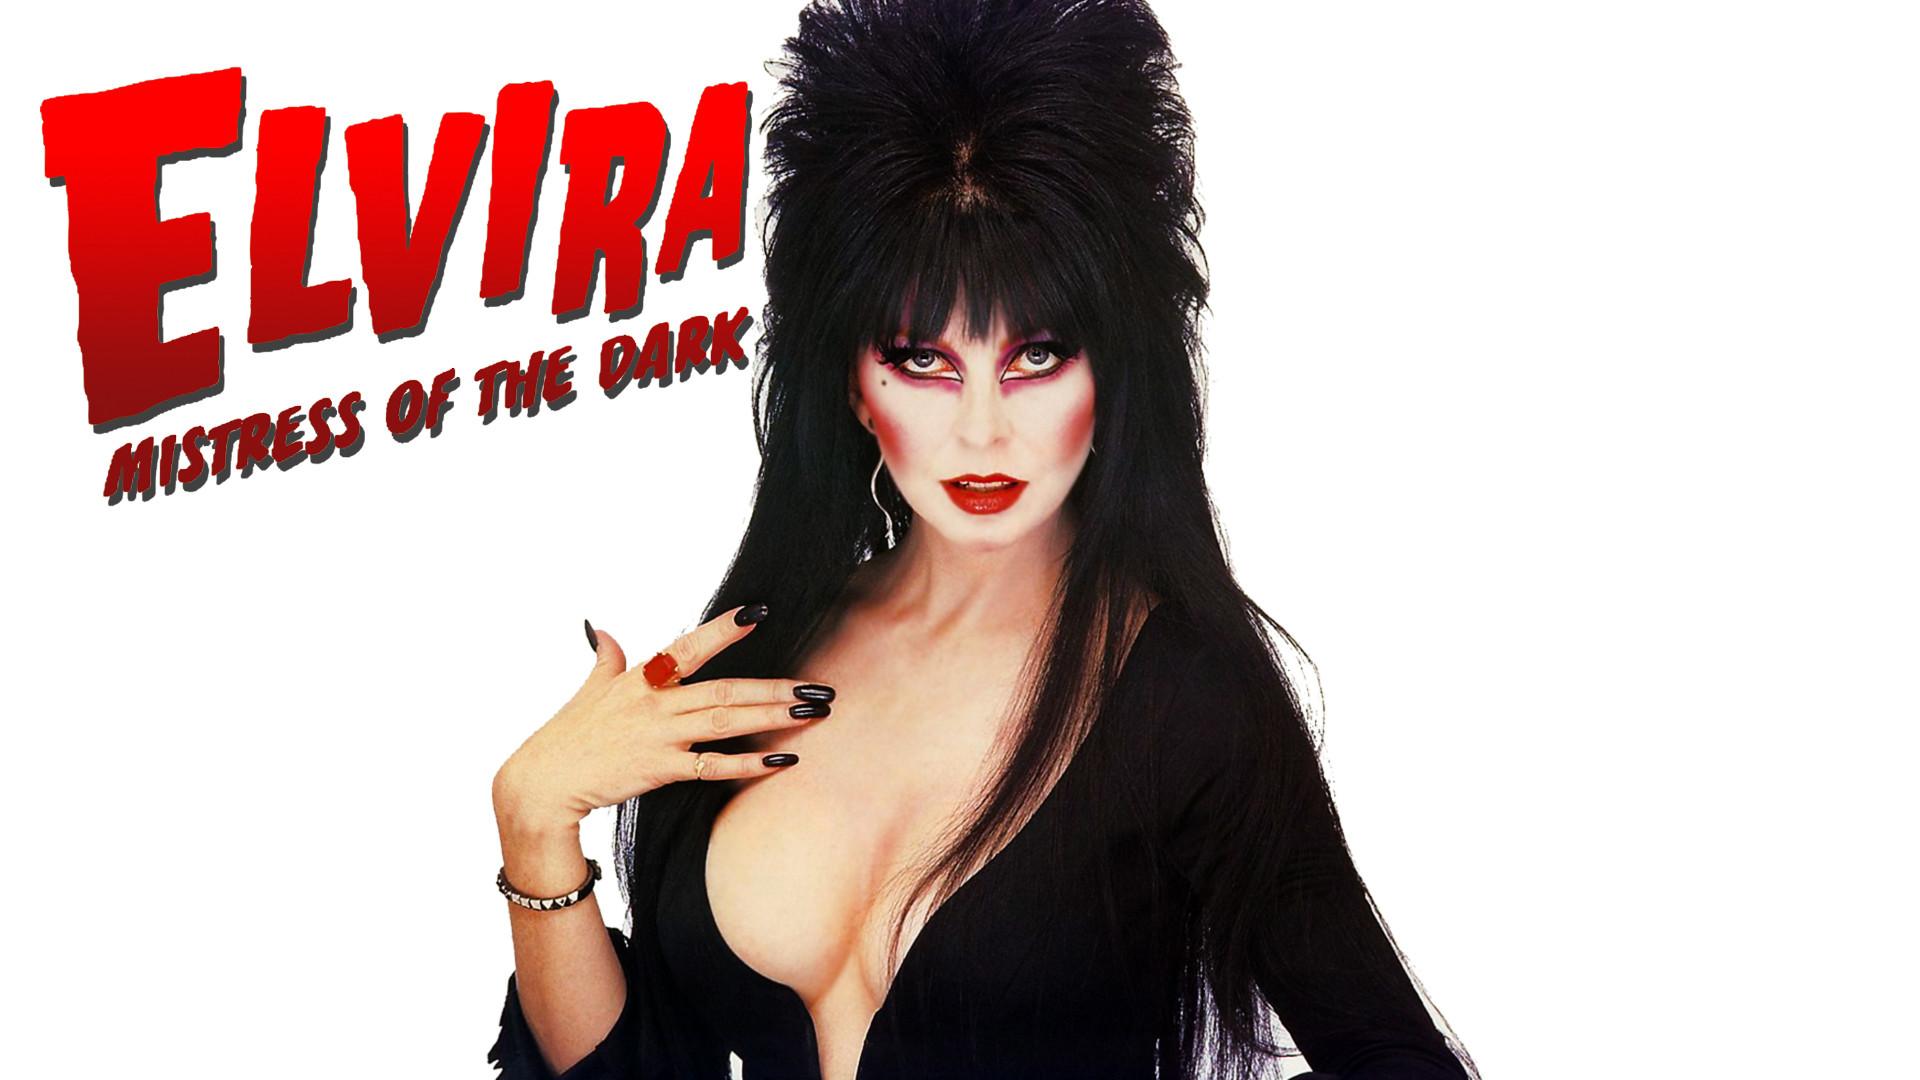 Elvira Mistress Of The Dark Makeup